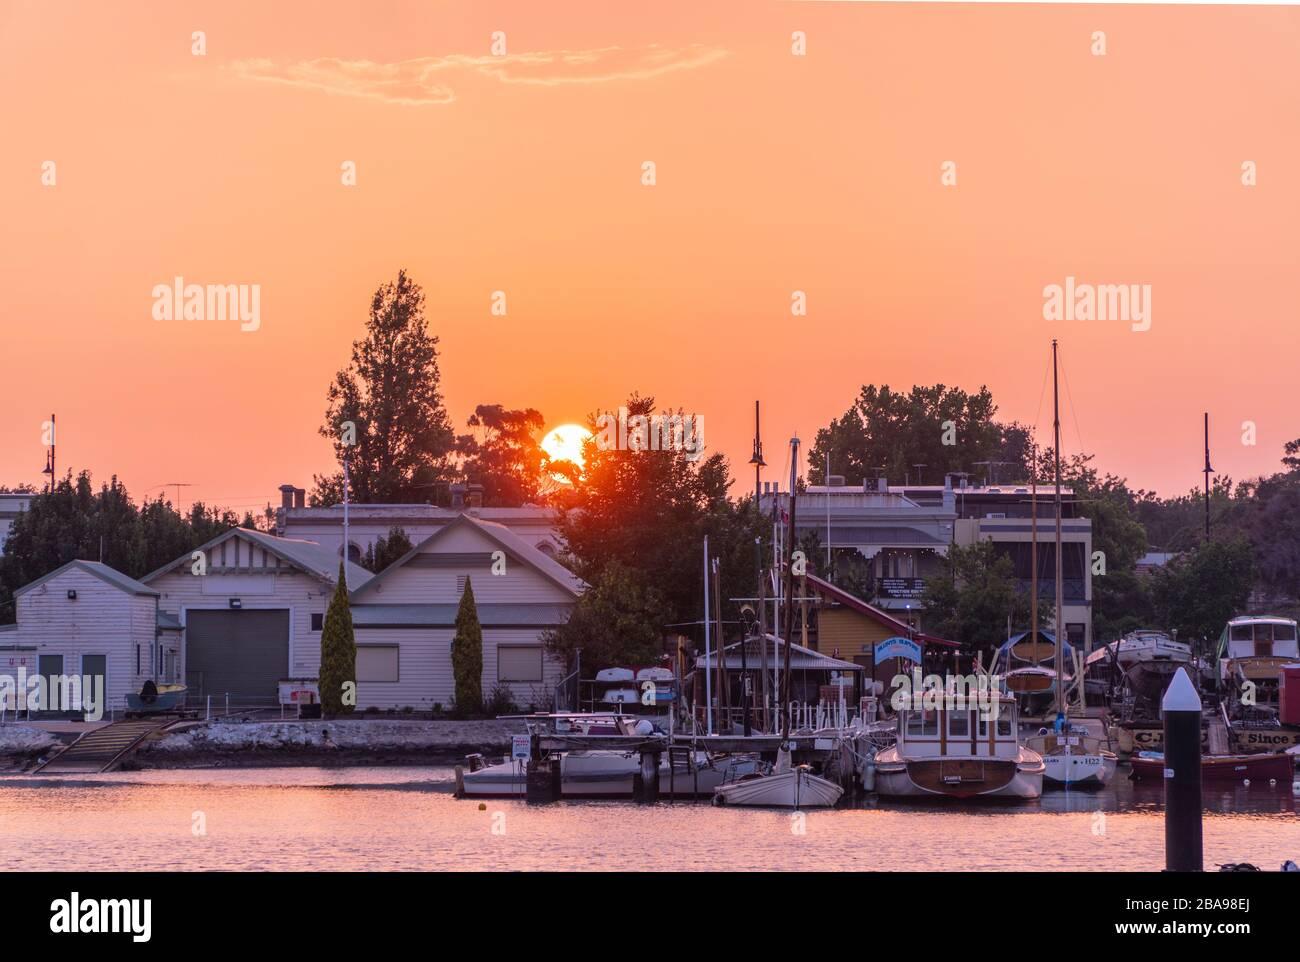 Sunset at riverside house Stock Photo